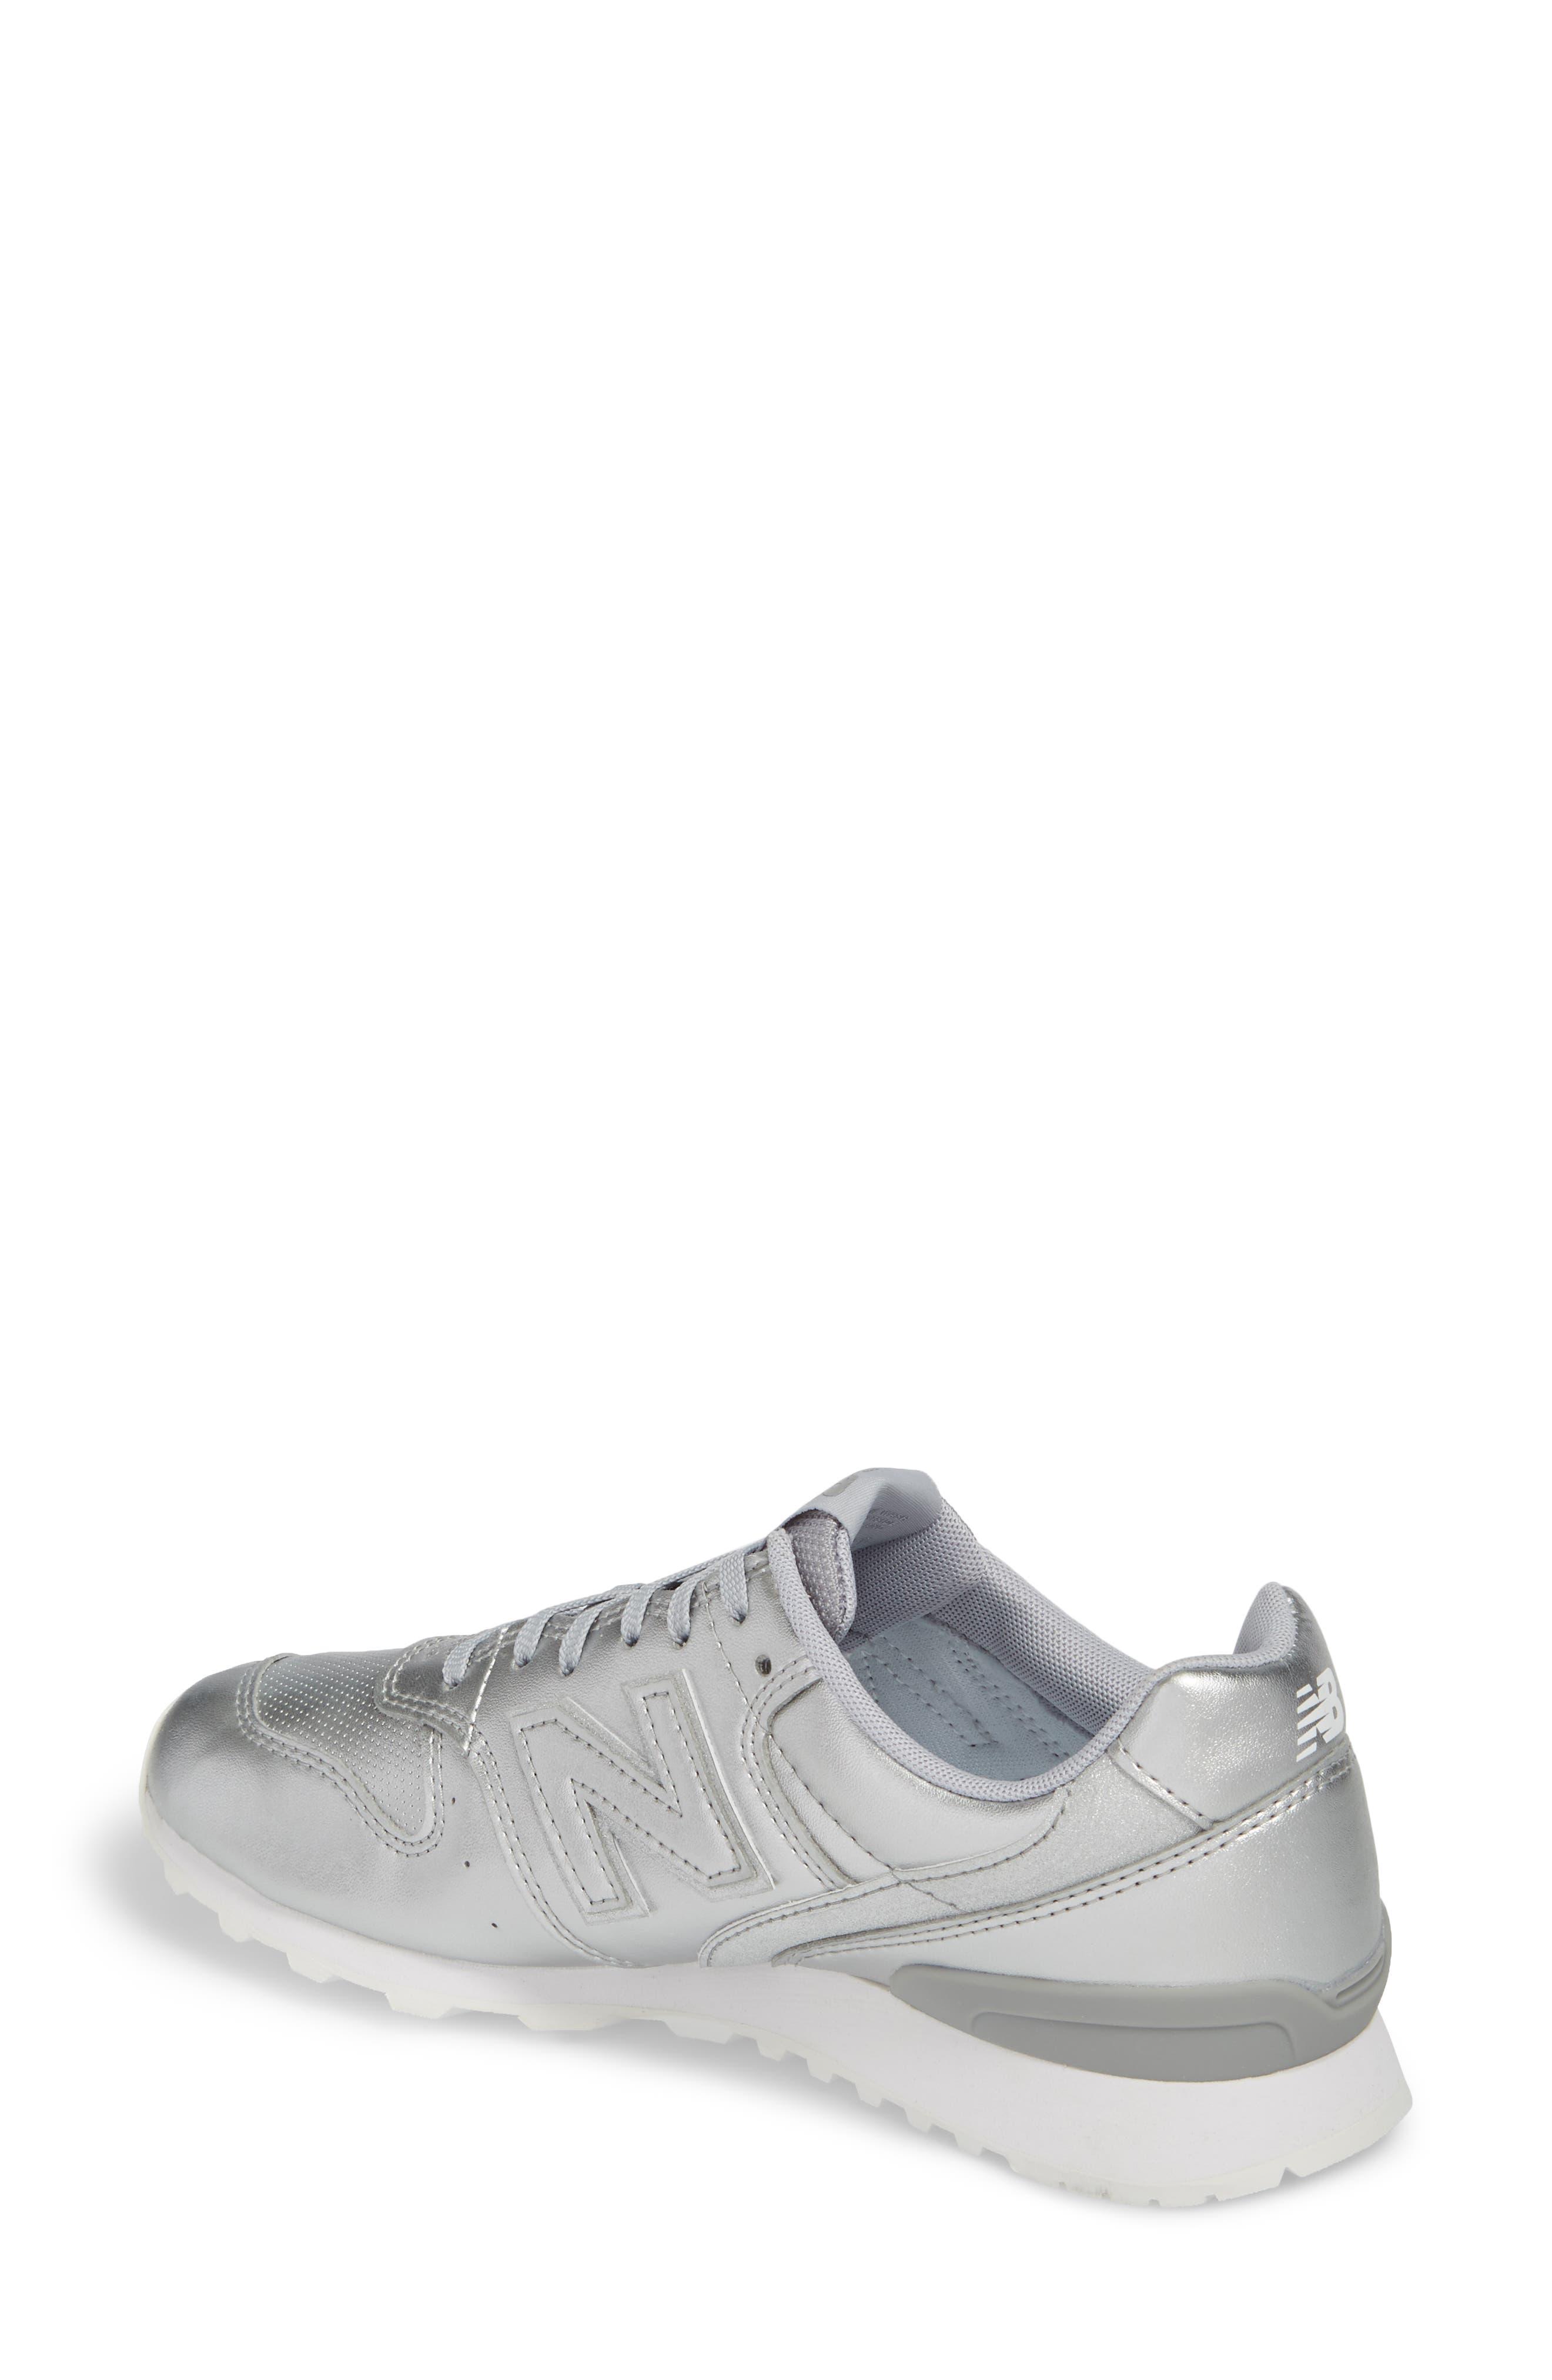 696 Sneaker,                             Alternate thumbnail 2, color,                             Metallic Silver